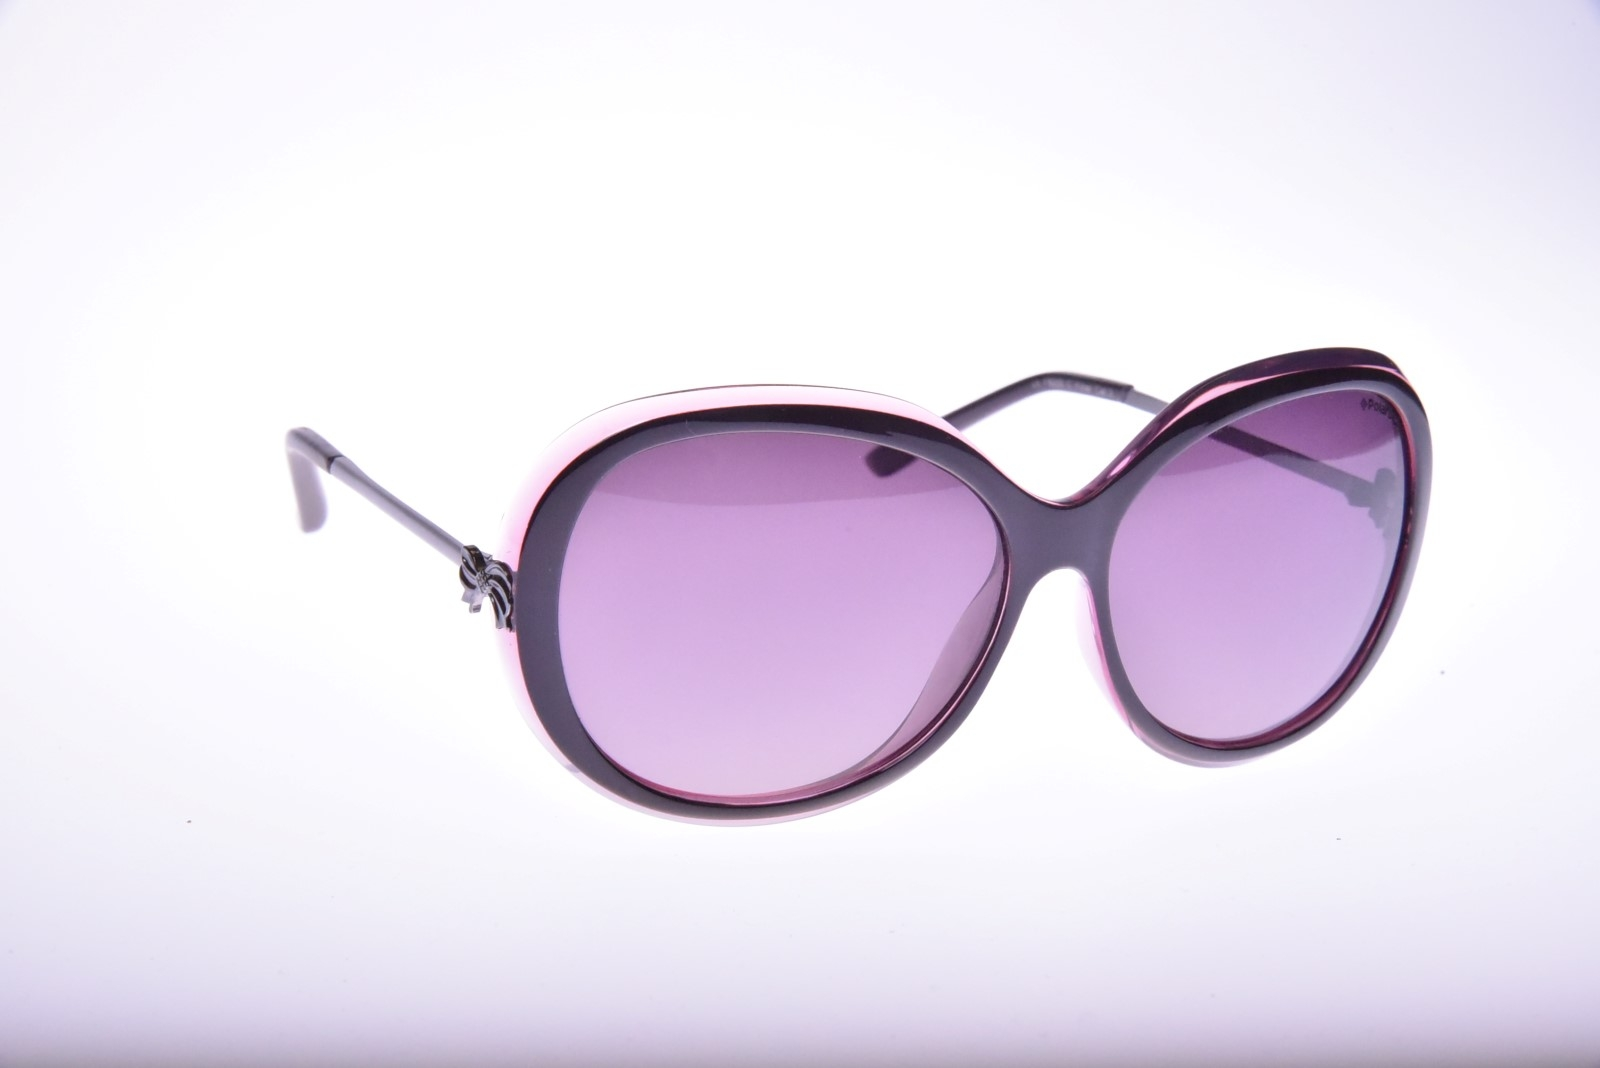 Polaroid Superior F8200C - Dámske slnečné okuliare